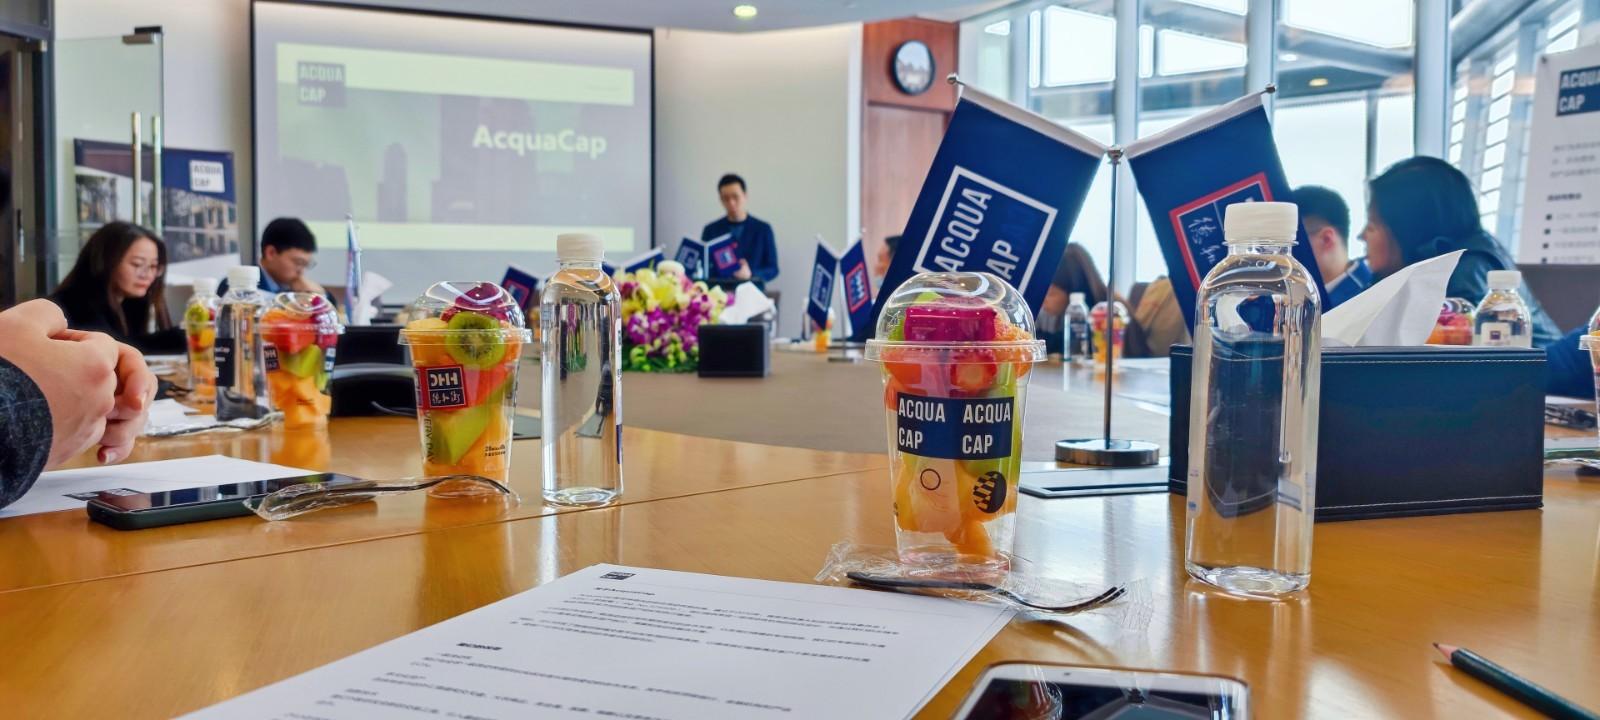 AcquaCap合规展业与机构业务扶持法务专题培训取得圆满成功